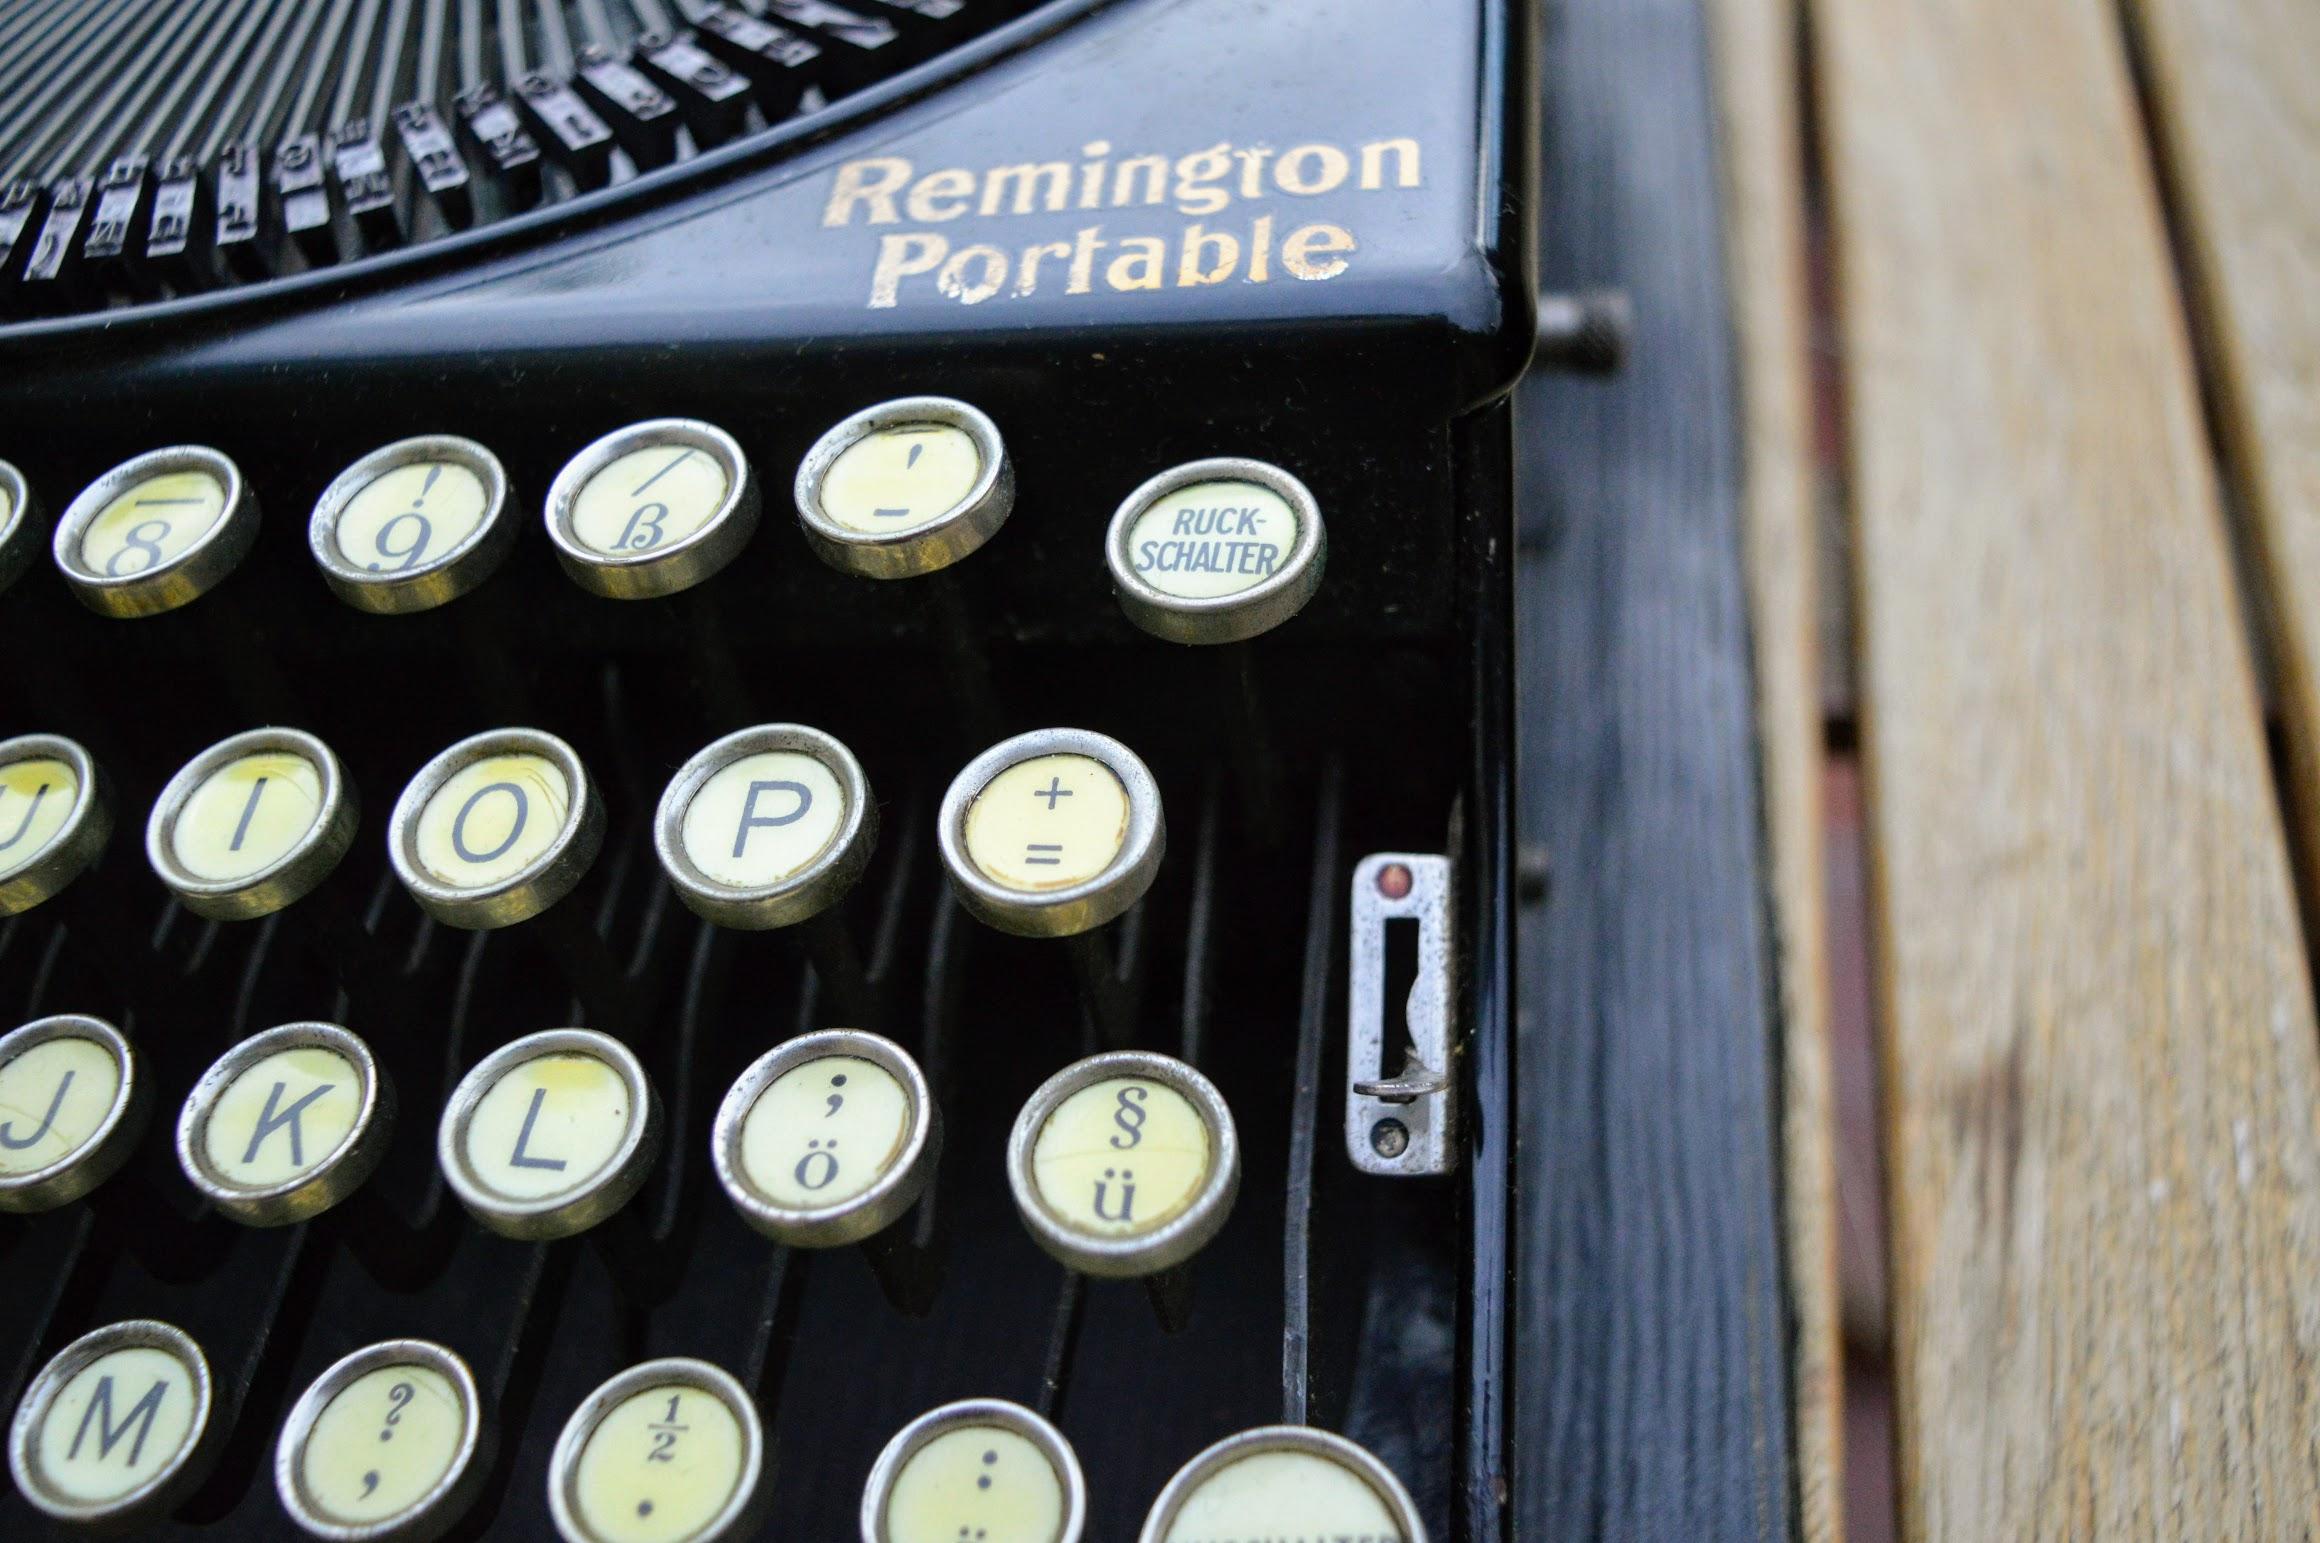 Remington Portable - Farbbandumschalter rot/schwarz